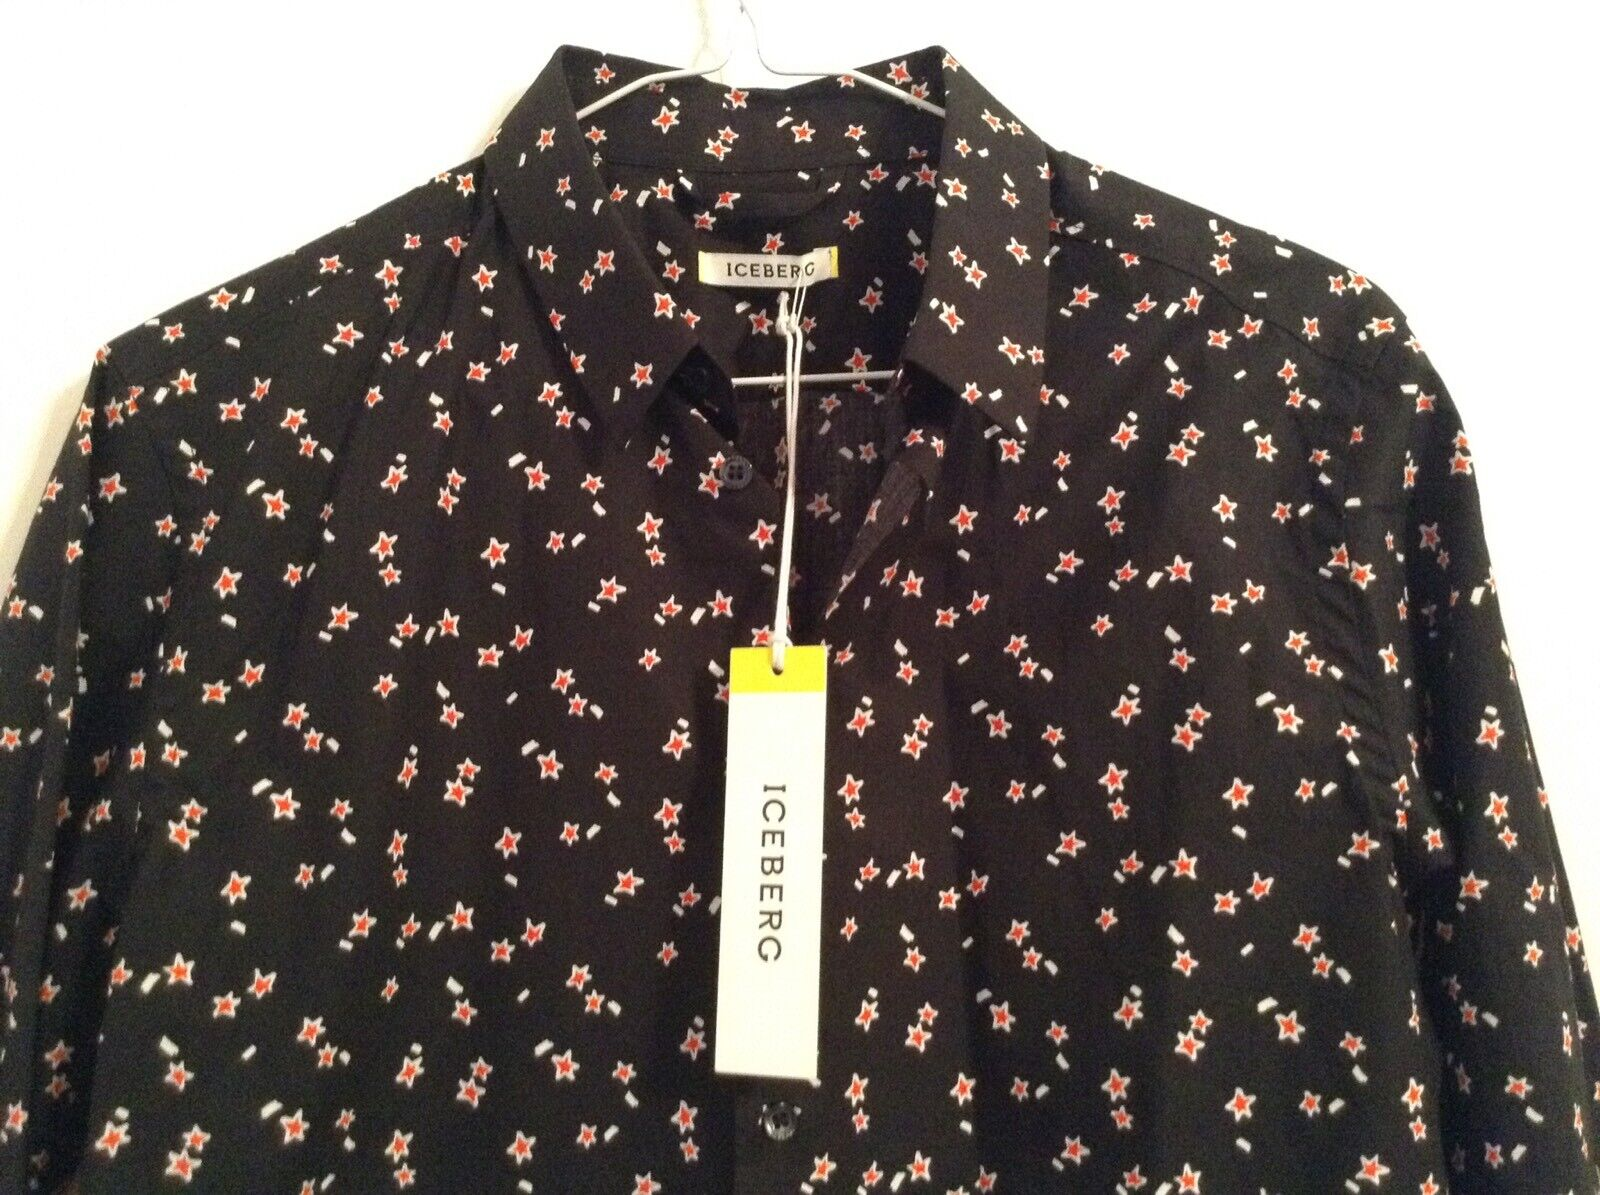 BNWT 100% Auth ICEBERG, Mens Iconic Star Print Shirt S RRP